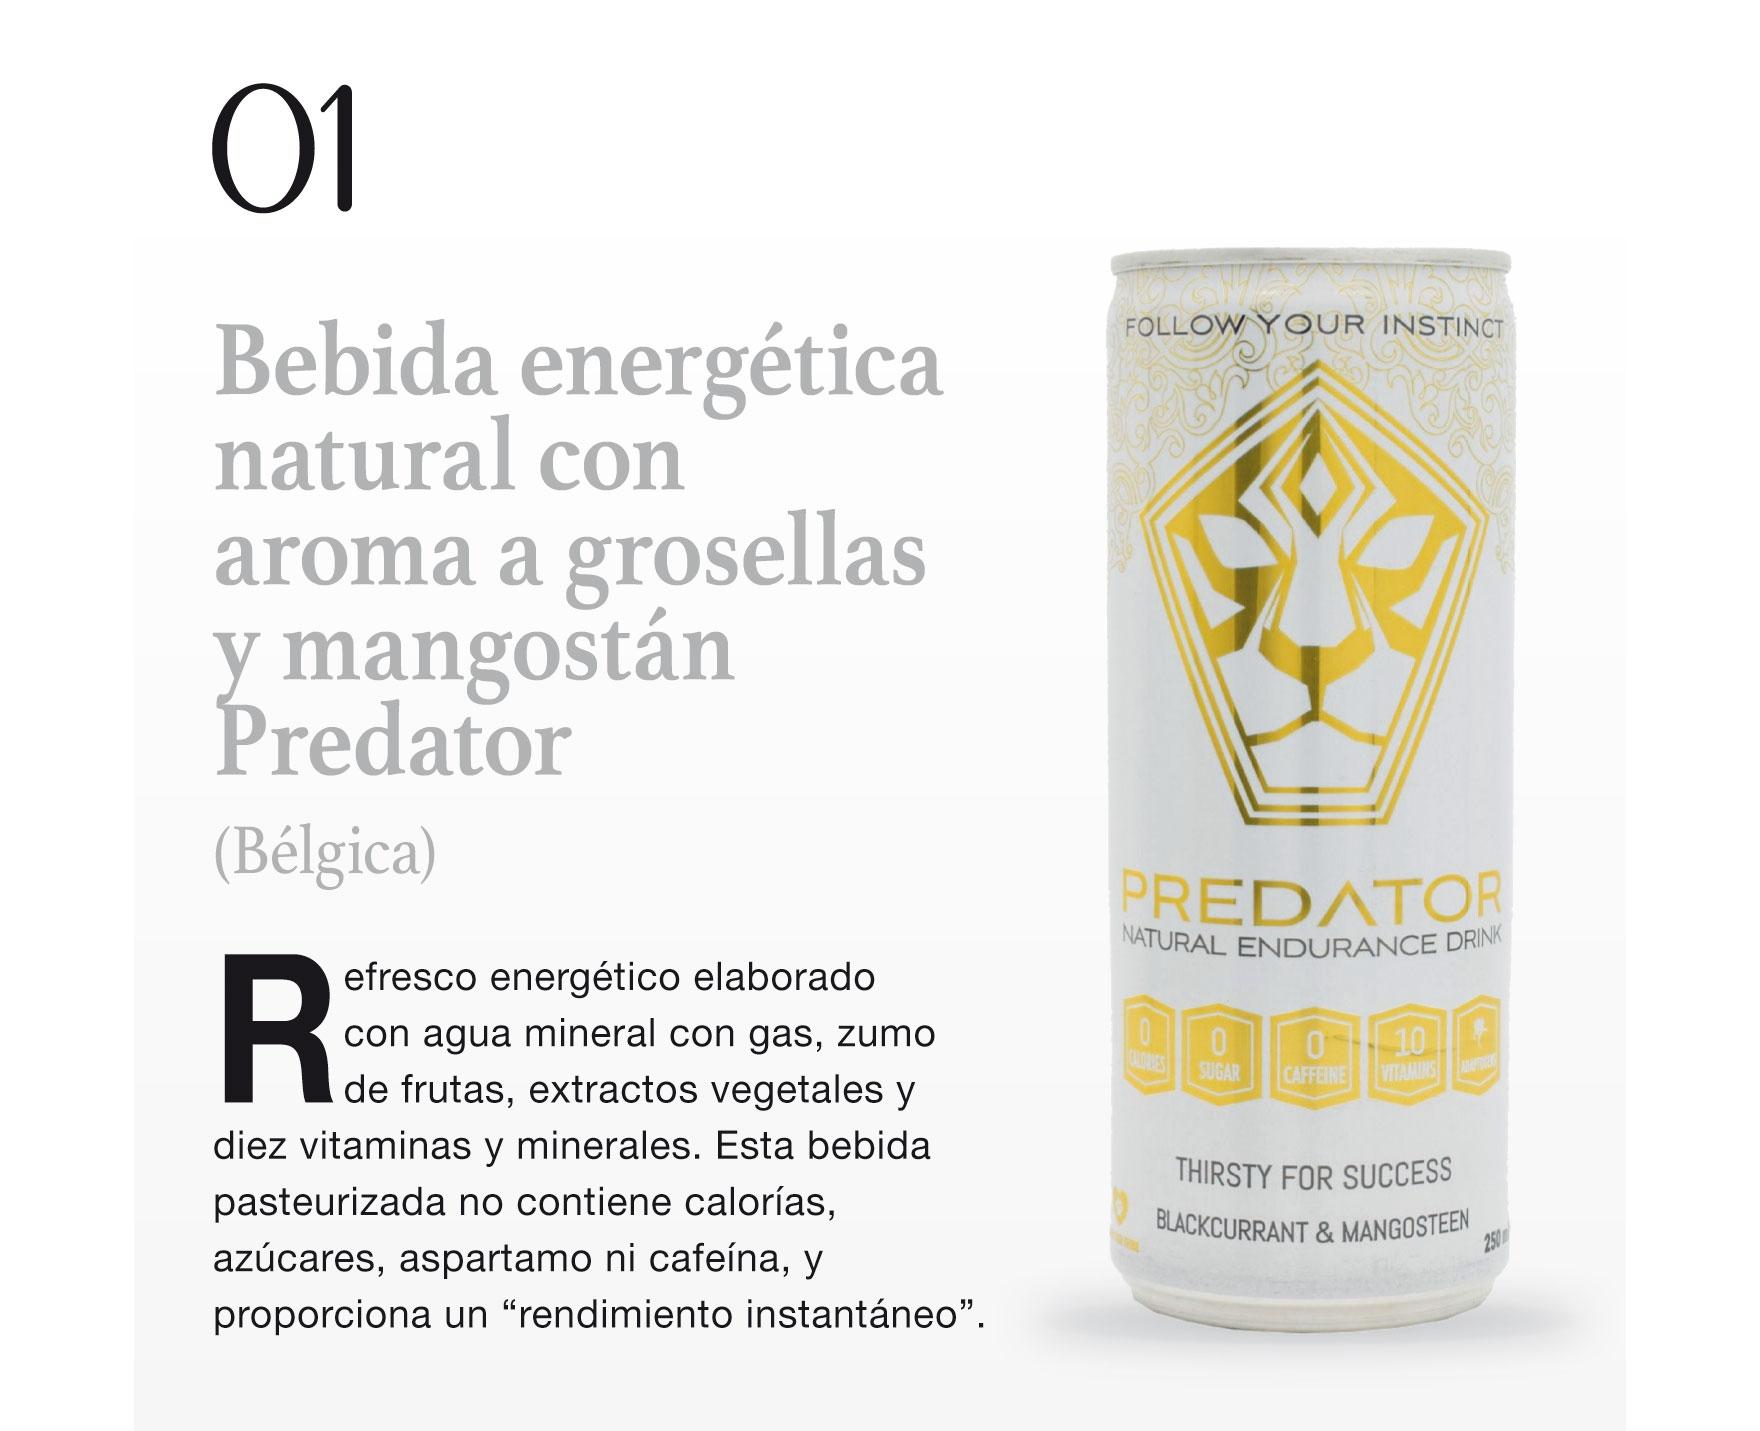 Bebida energética natural con aroma a grosellas y mangostán Predator (Bélgica)